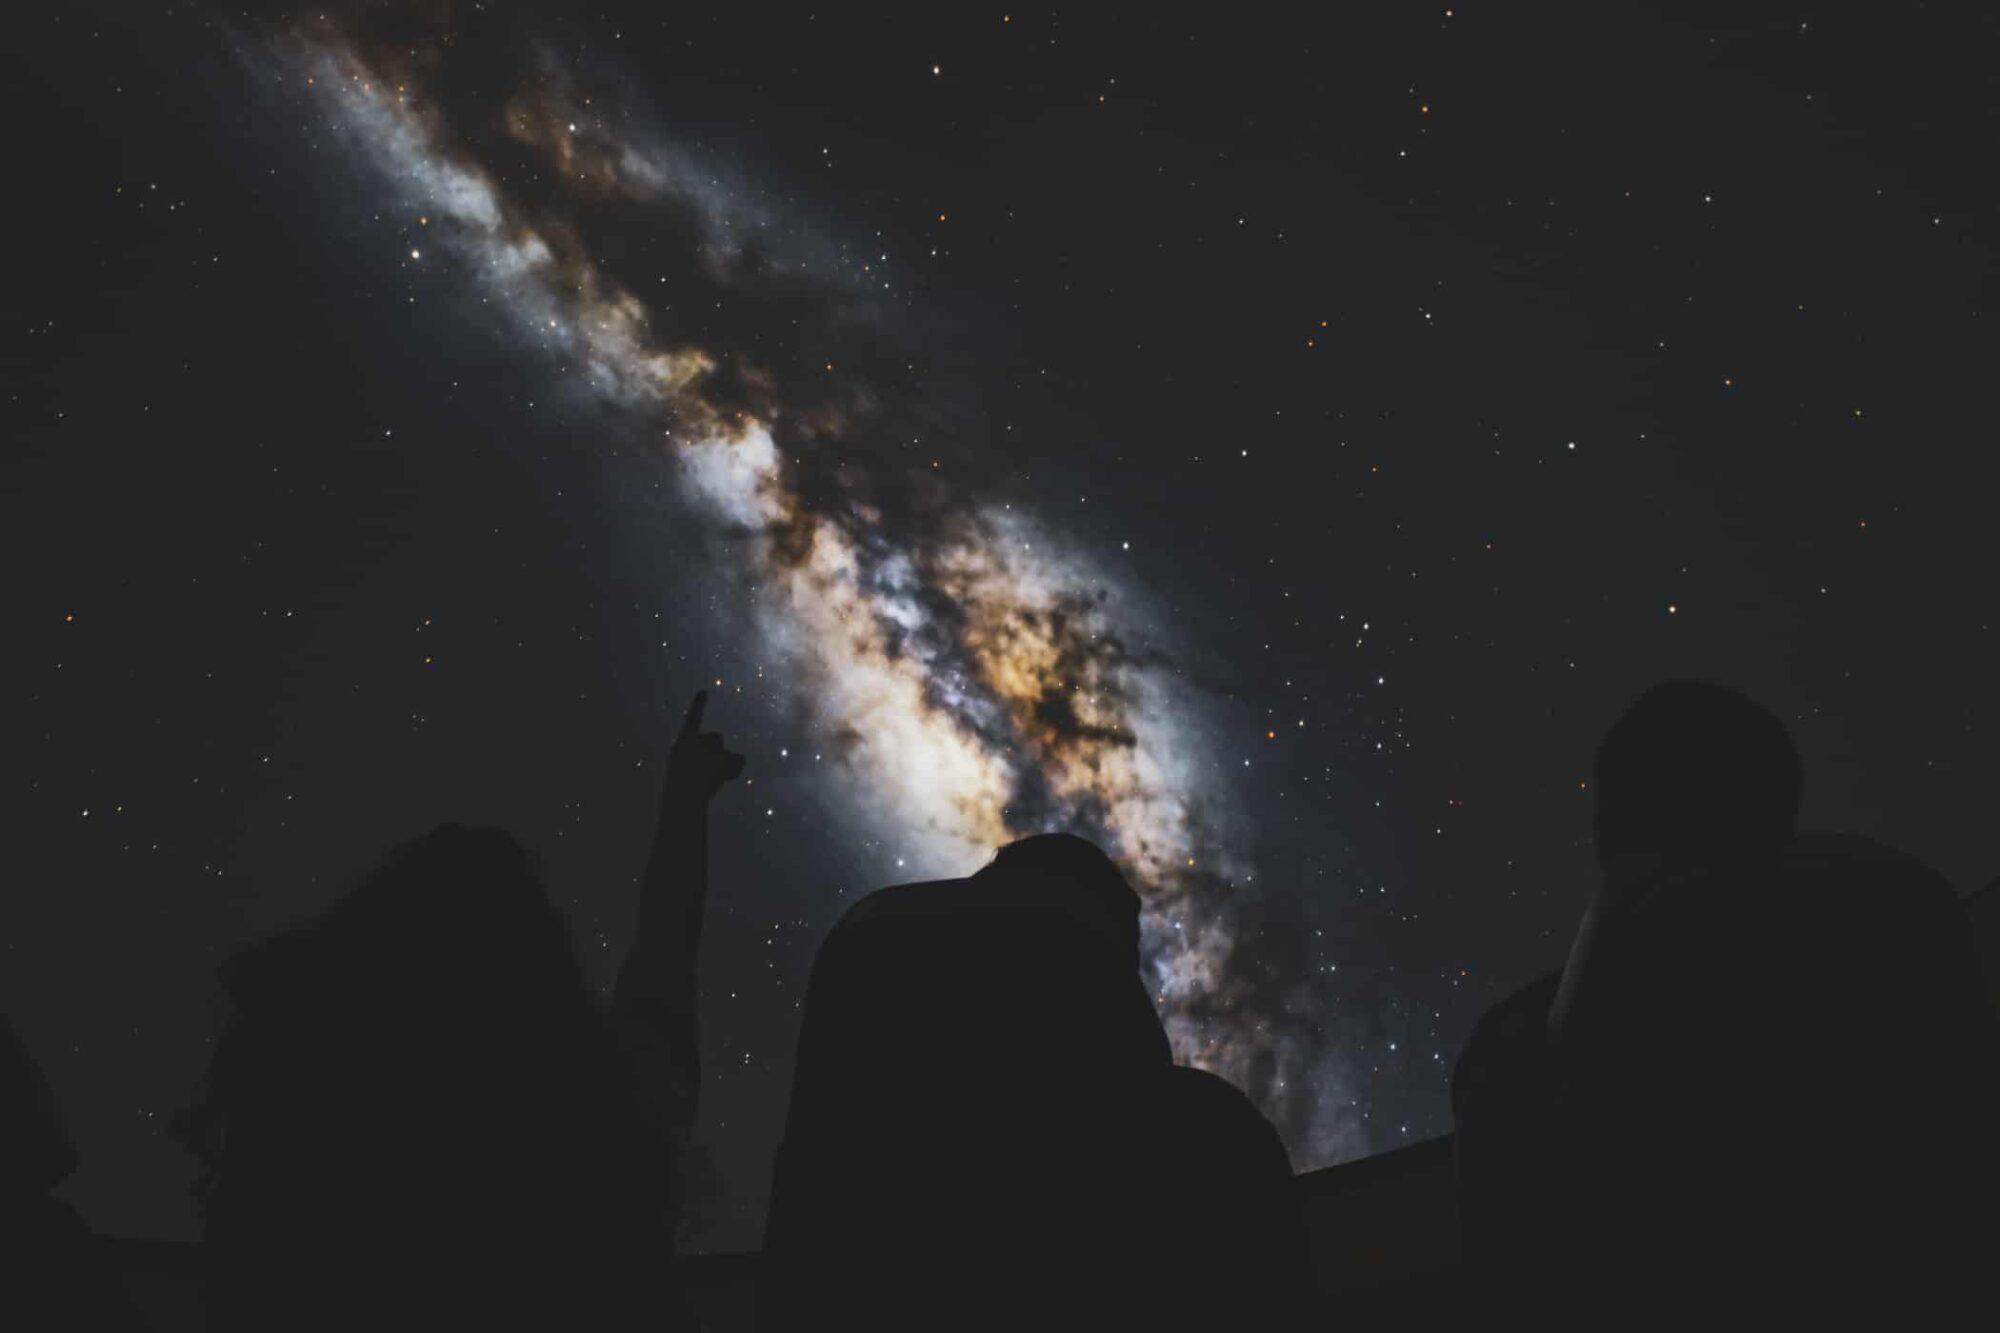 Planetarium Milkyway